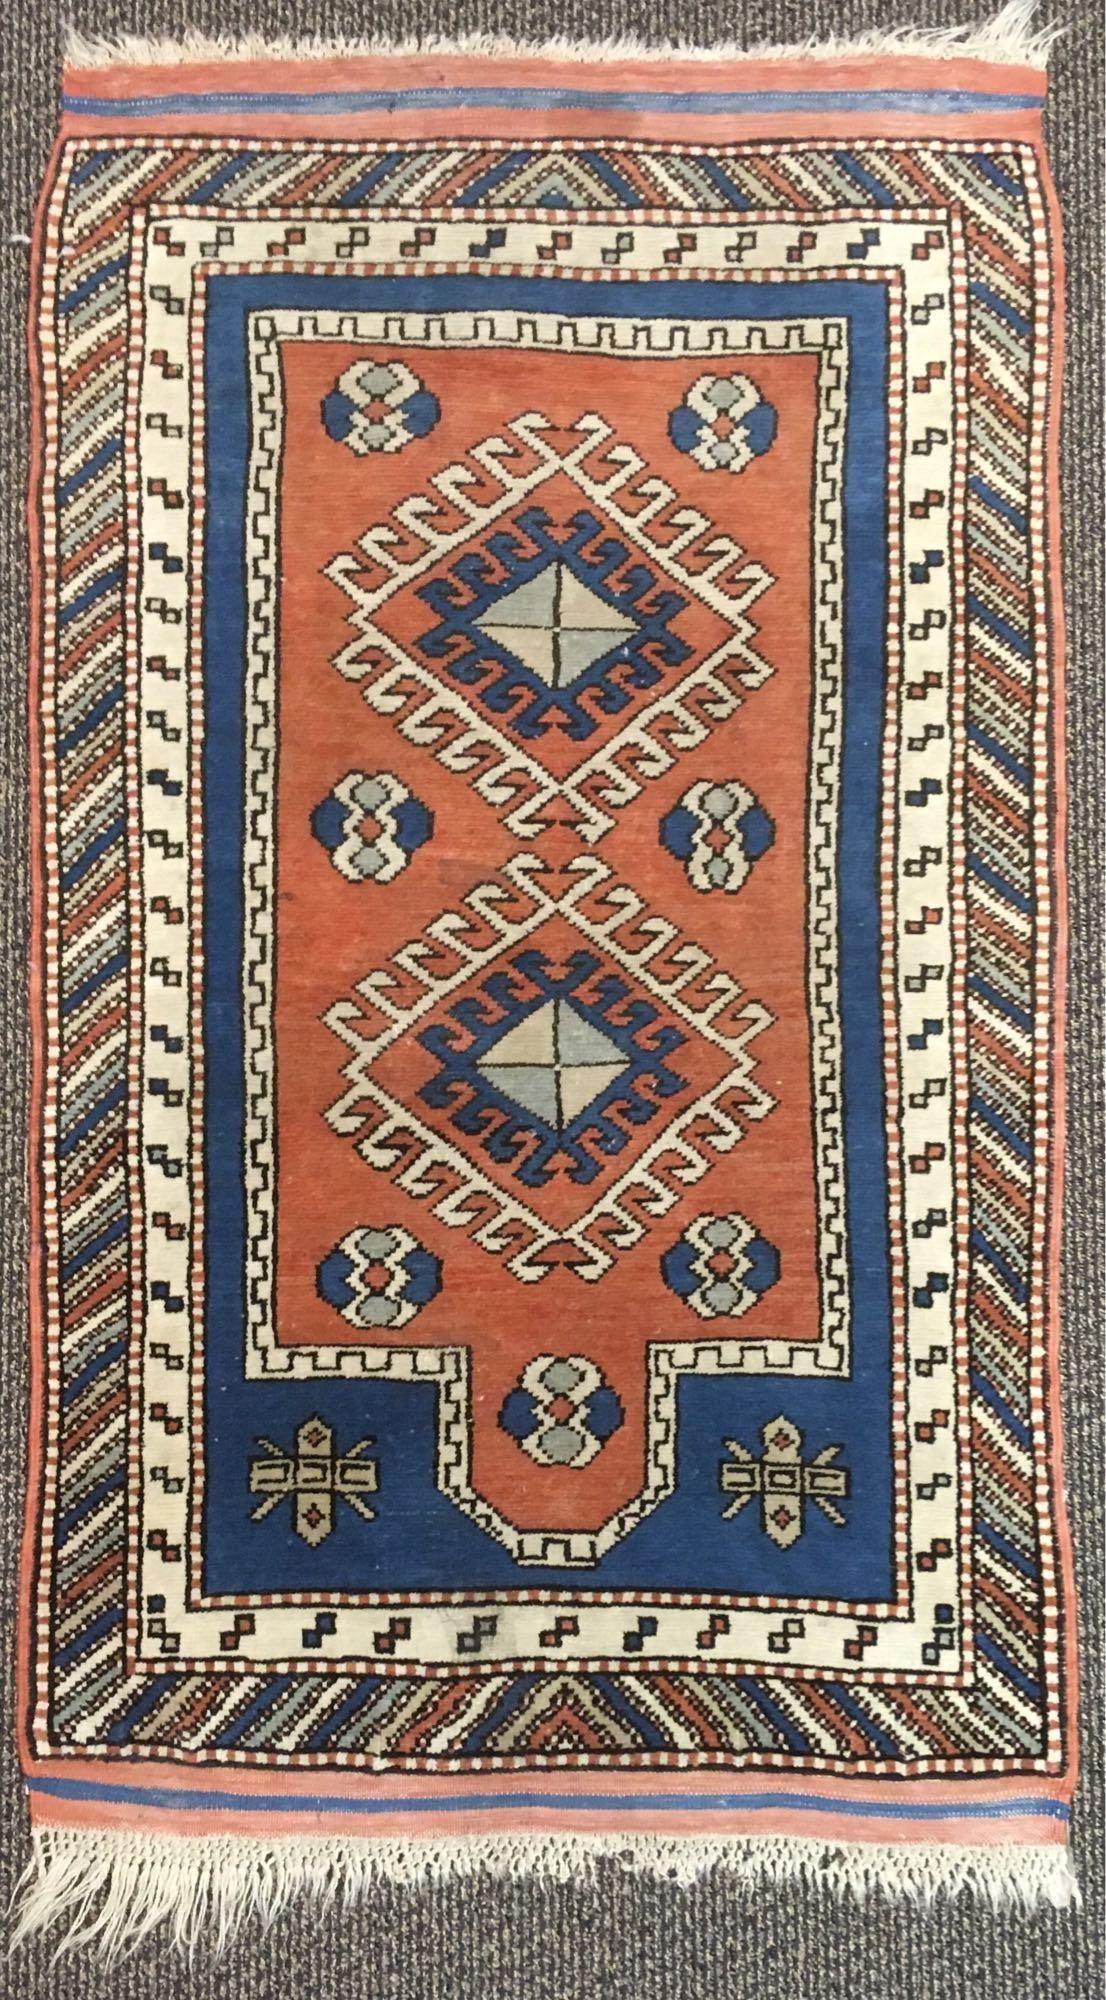 Vintage Hand Woven Wool Turkish Kazak Area Rug